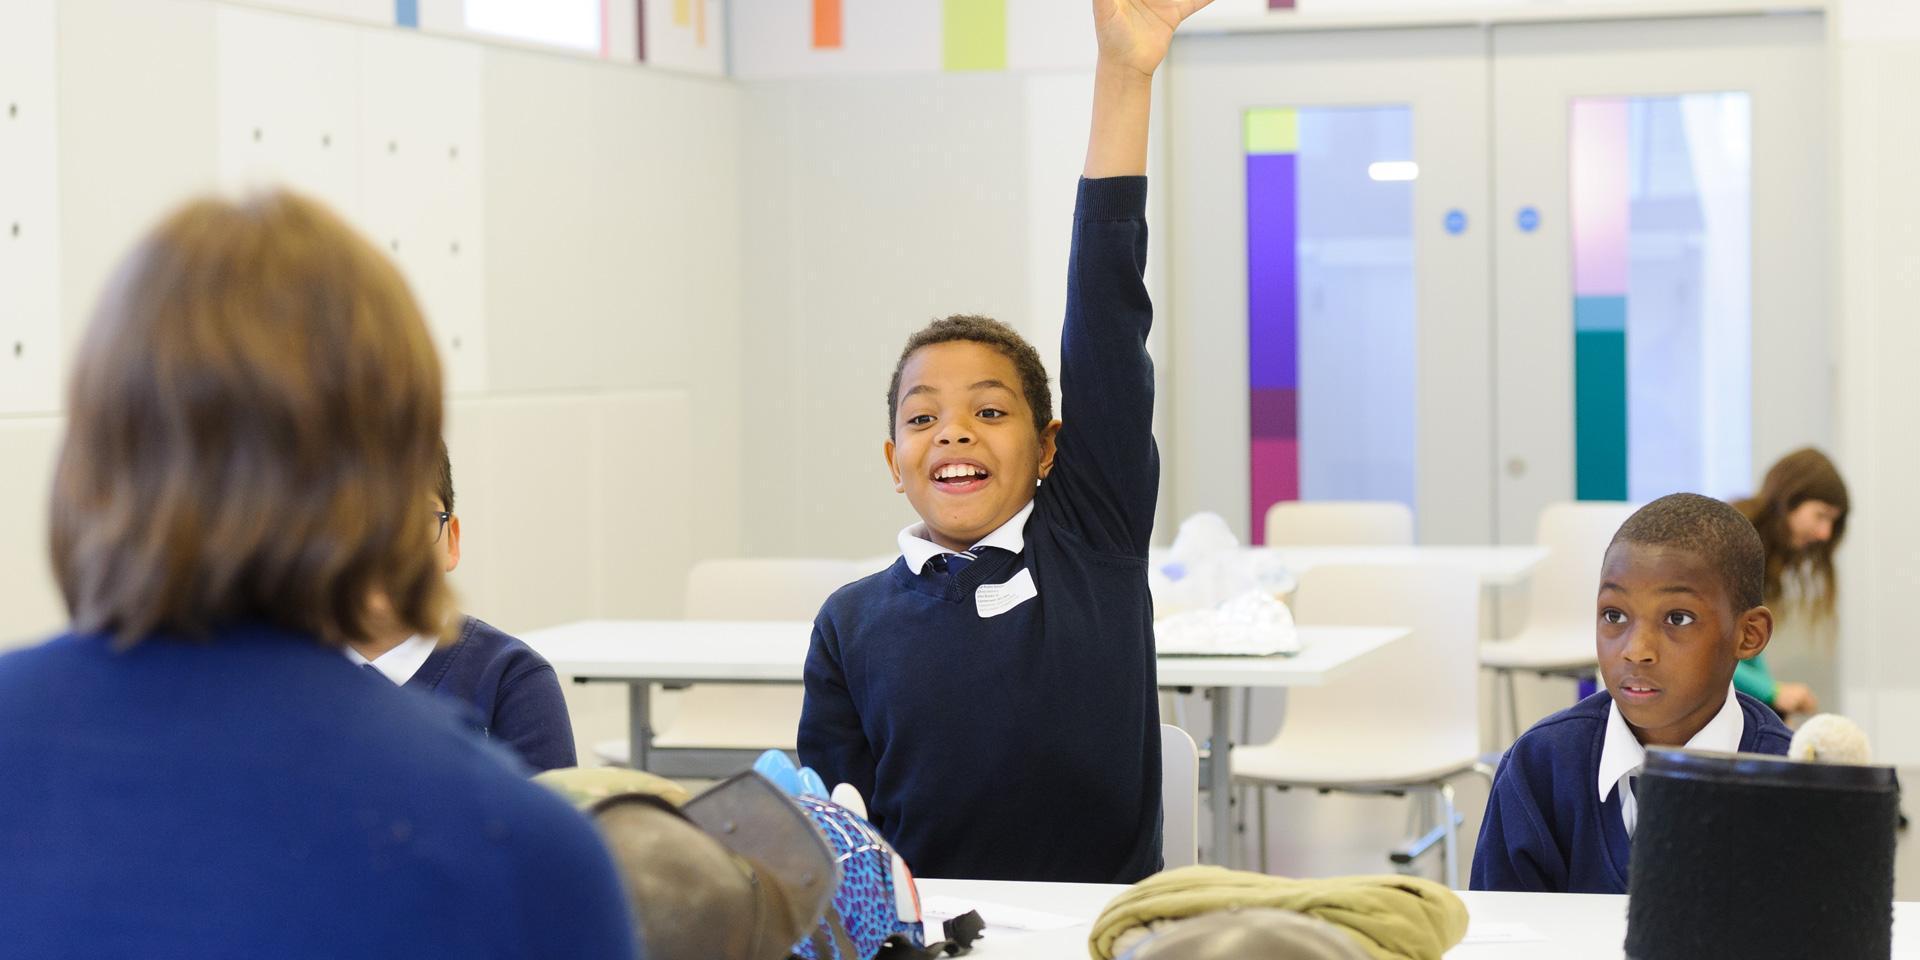 School children attending a workshop